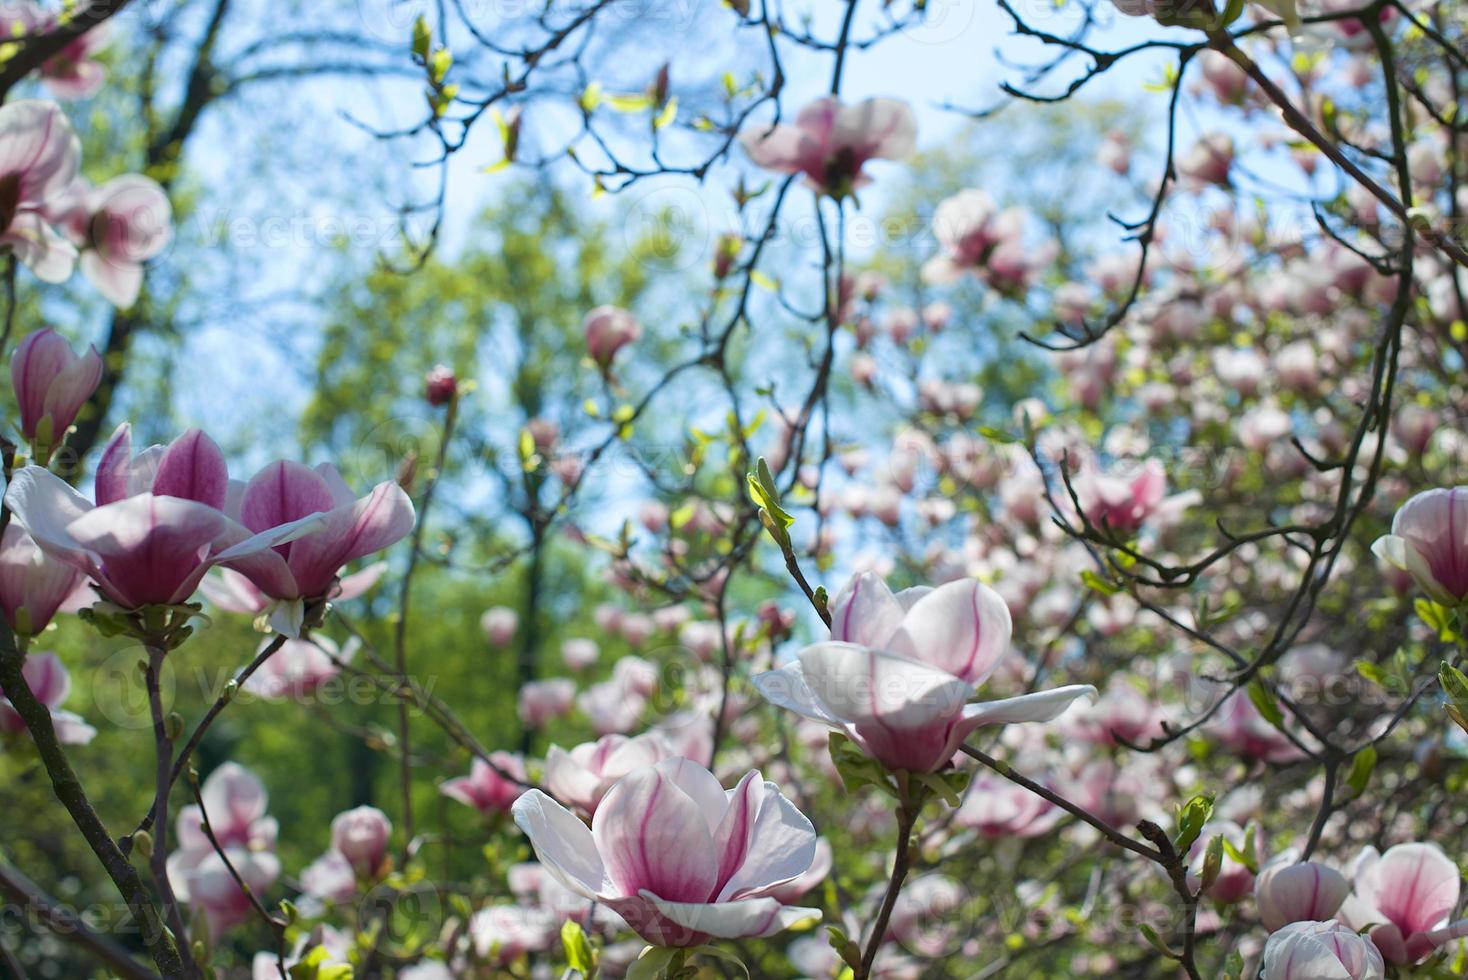 magnolia bloem boom in bloei foto